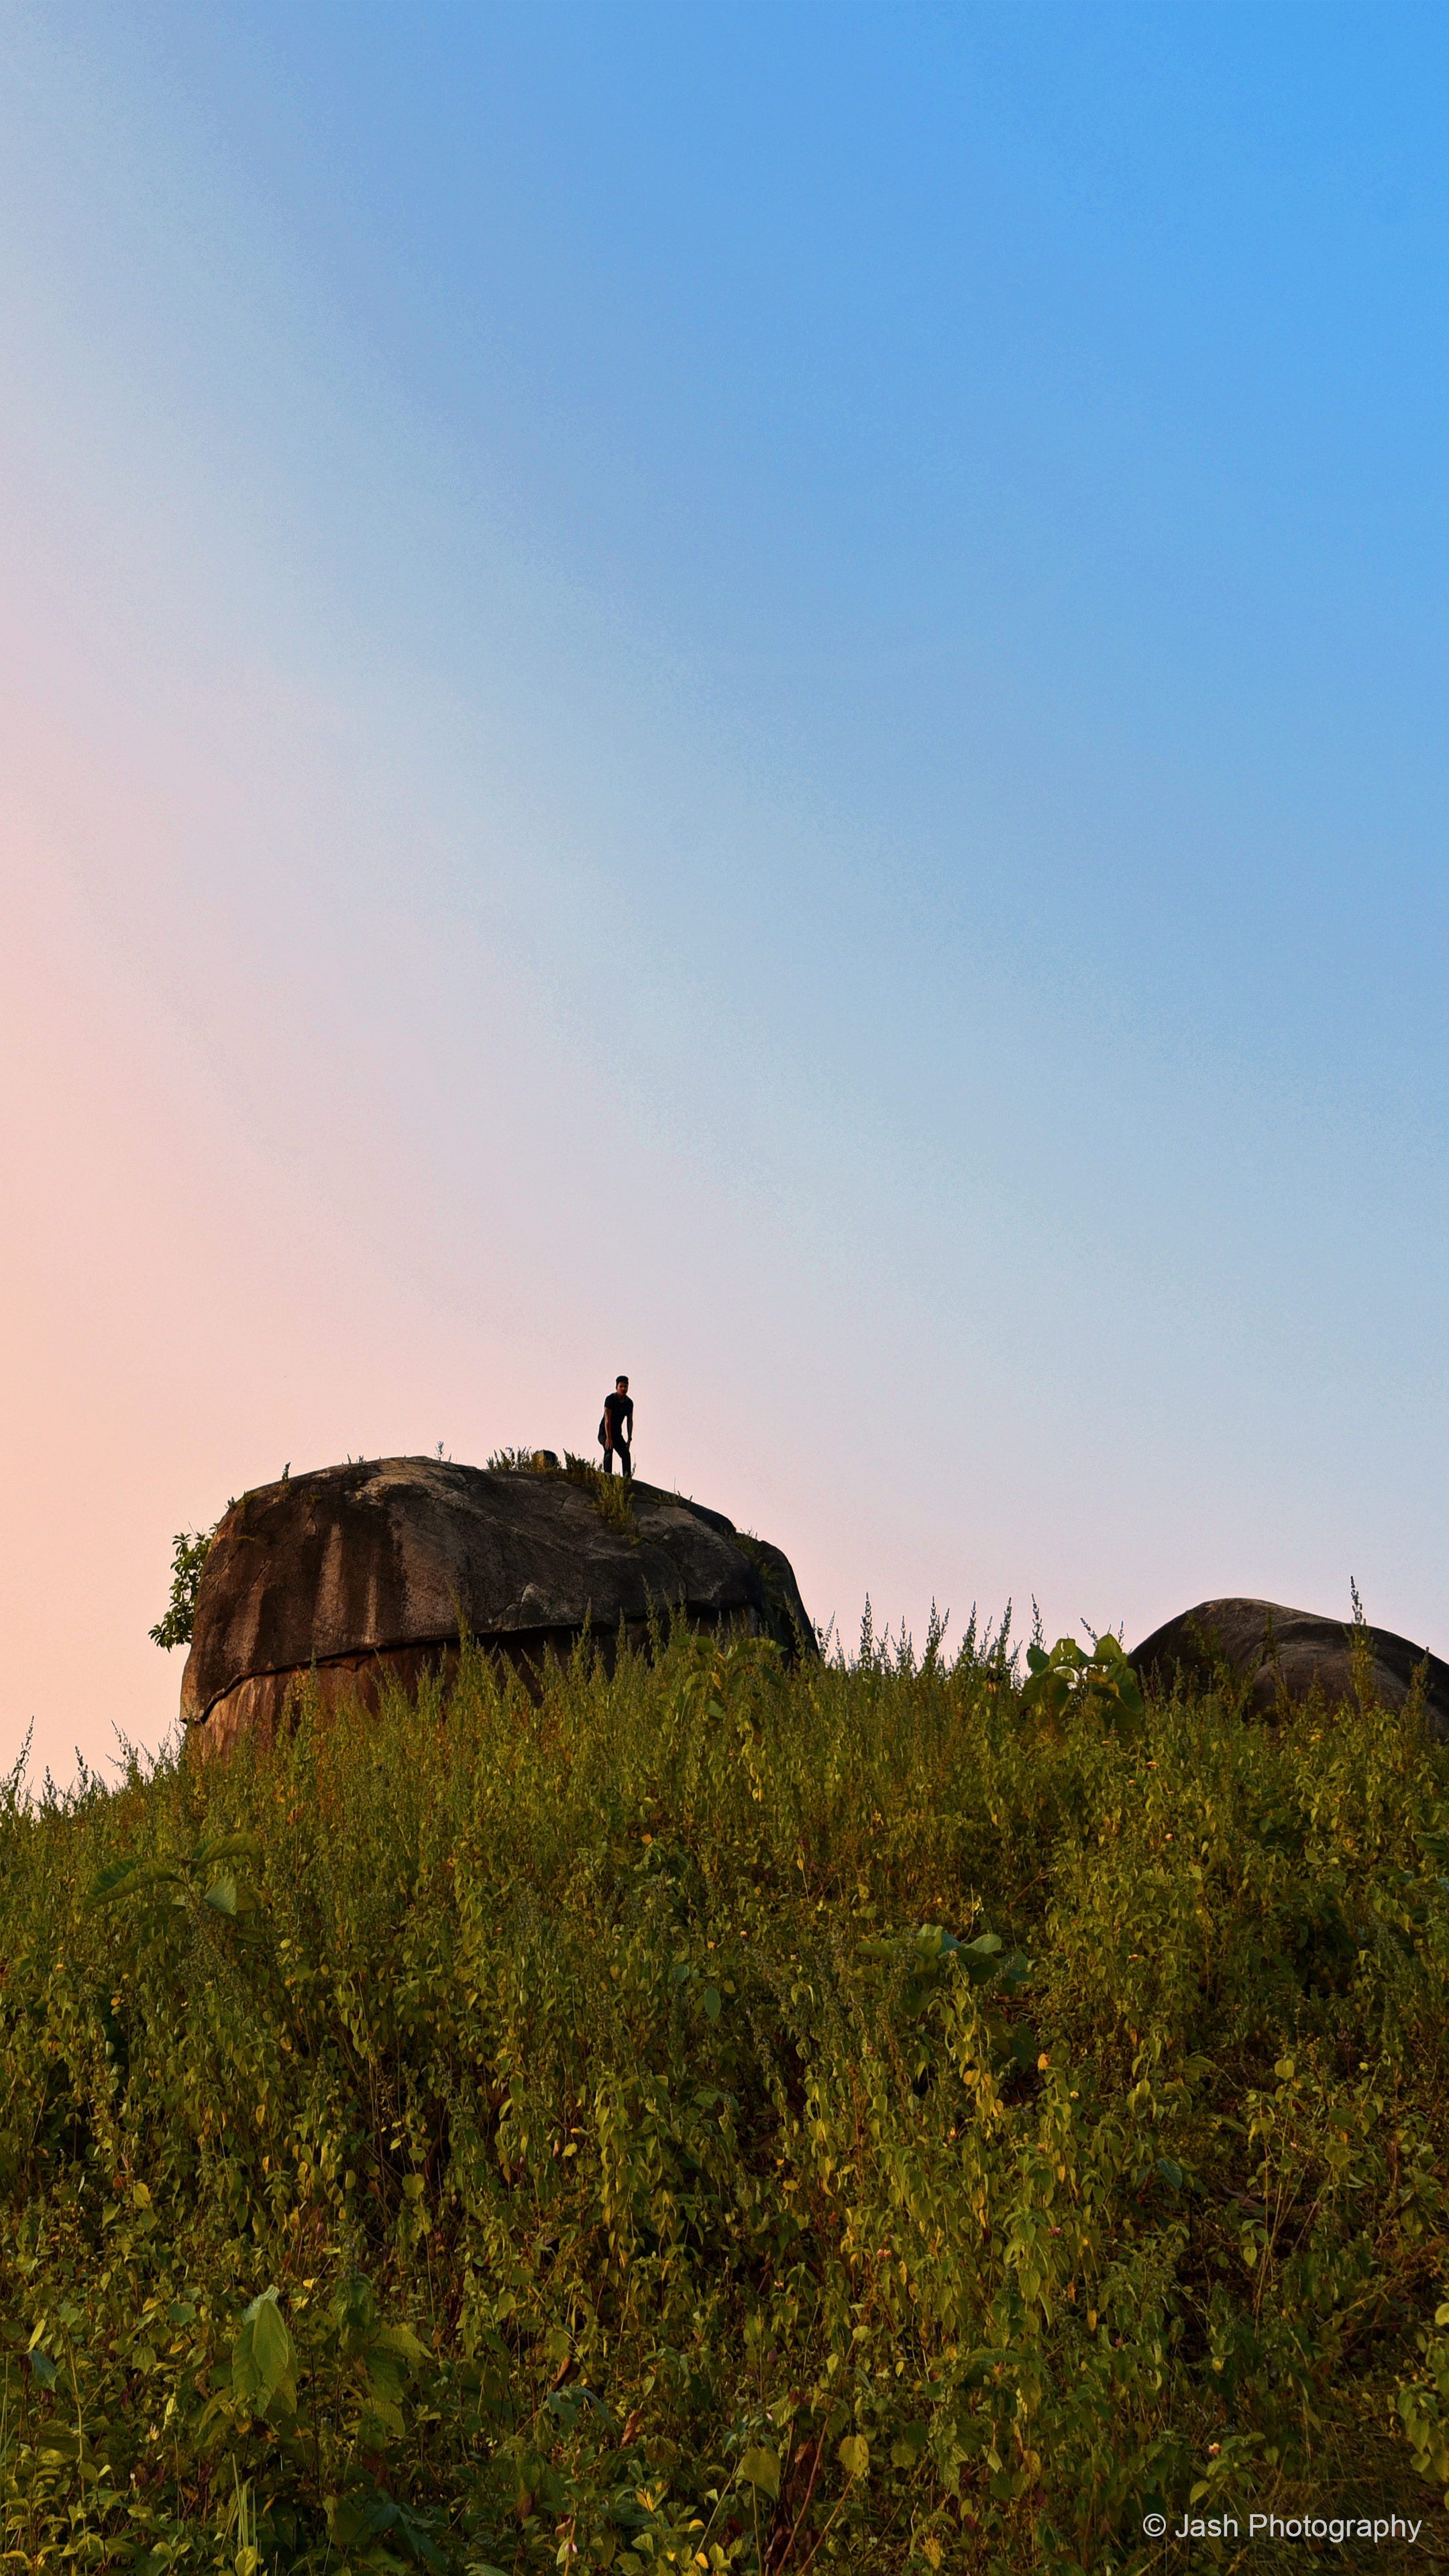 Man On Rock Landscape Photography 4k Ultra Hd Mobile Wallpaper